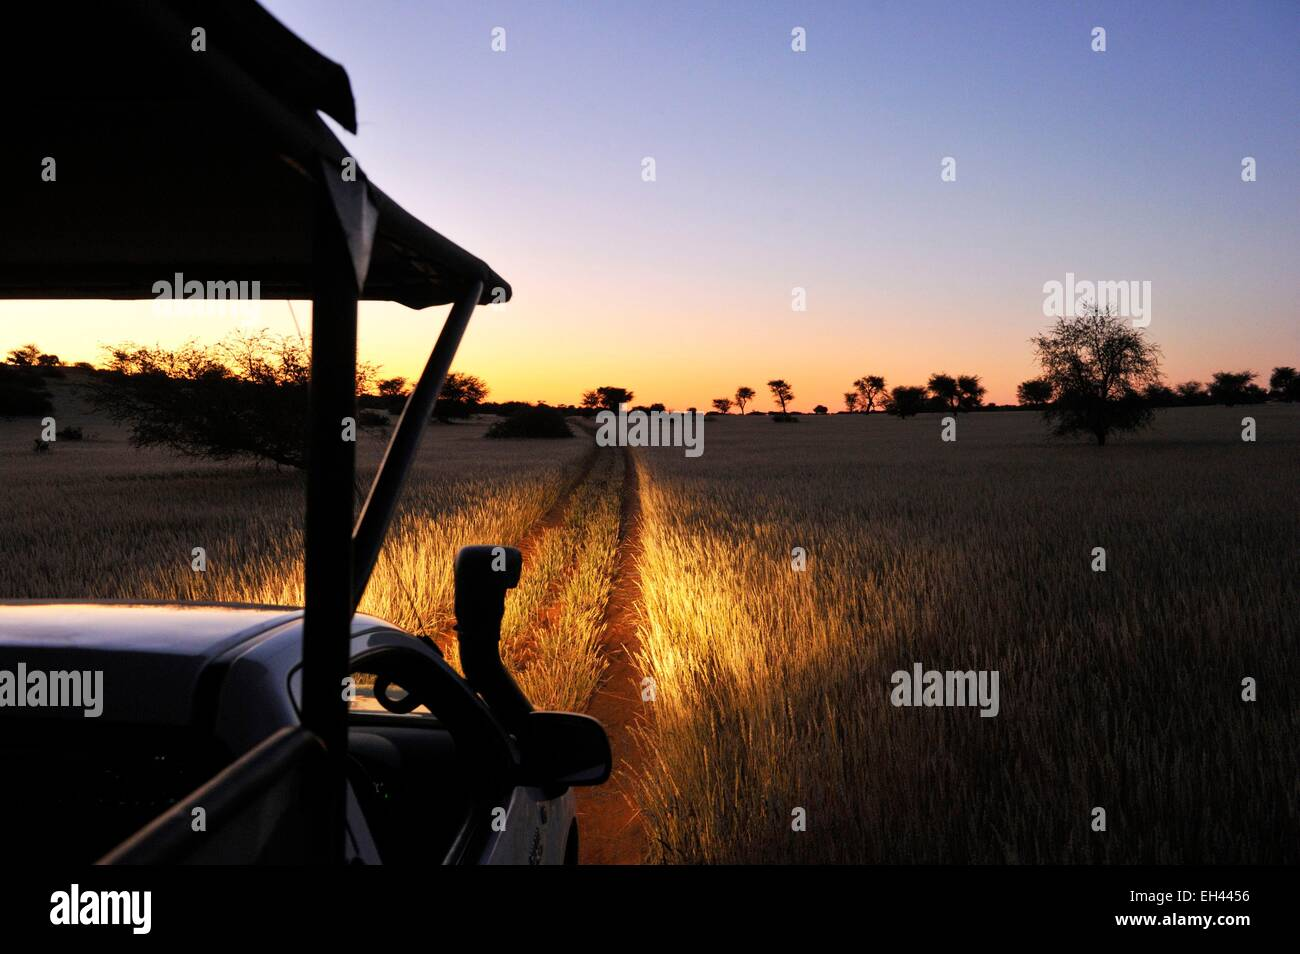 Namibia, Kalahari desert, Intu Afrika Kalahari Game Reserve, night safari - Stock Image